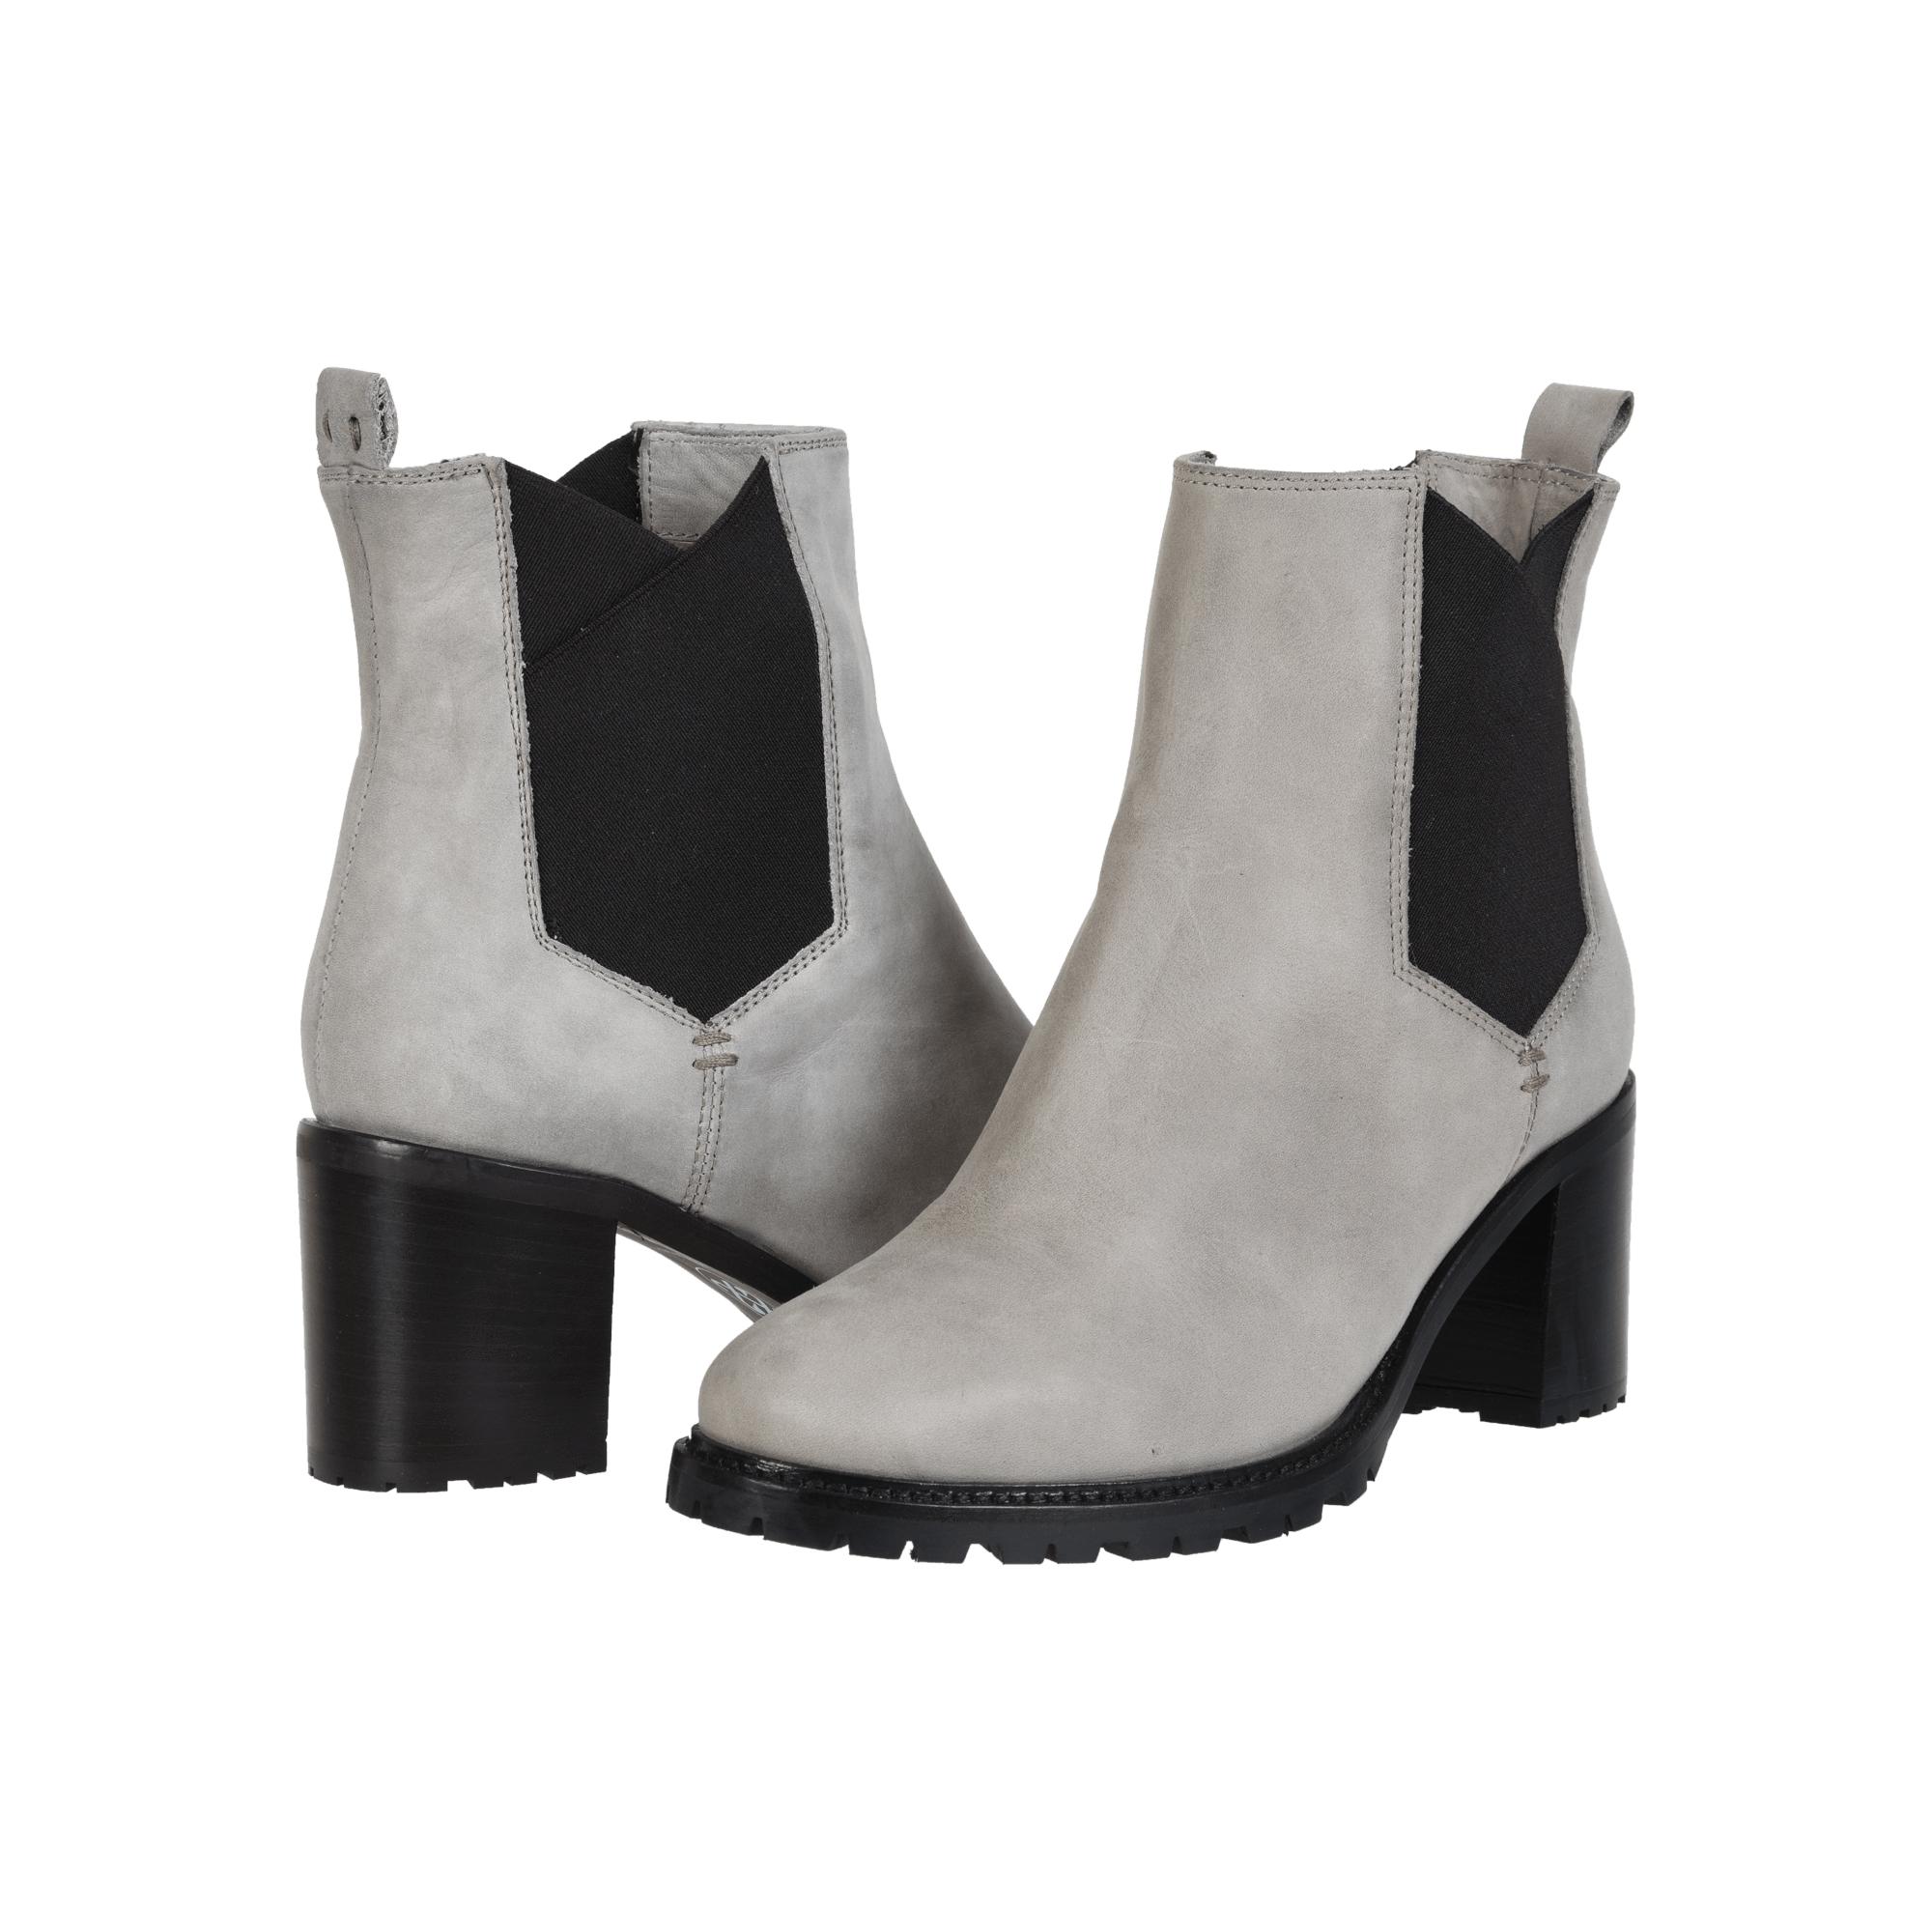 Ross & Snow Susana Women's Morning Dove Chelsea Boot - Discount Italian Shoes